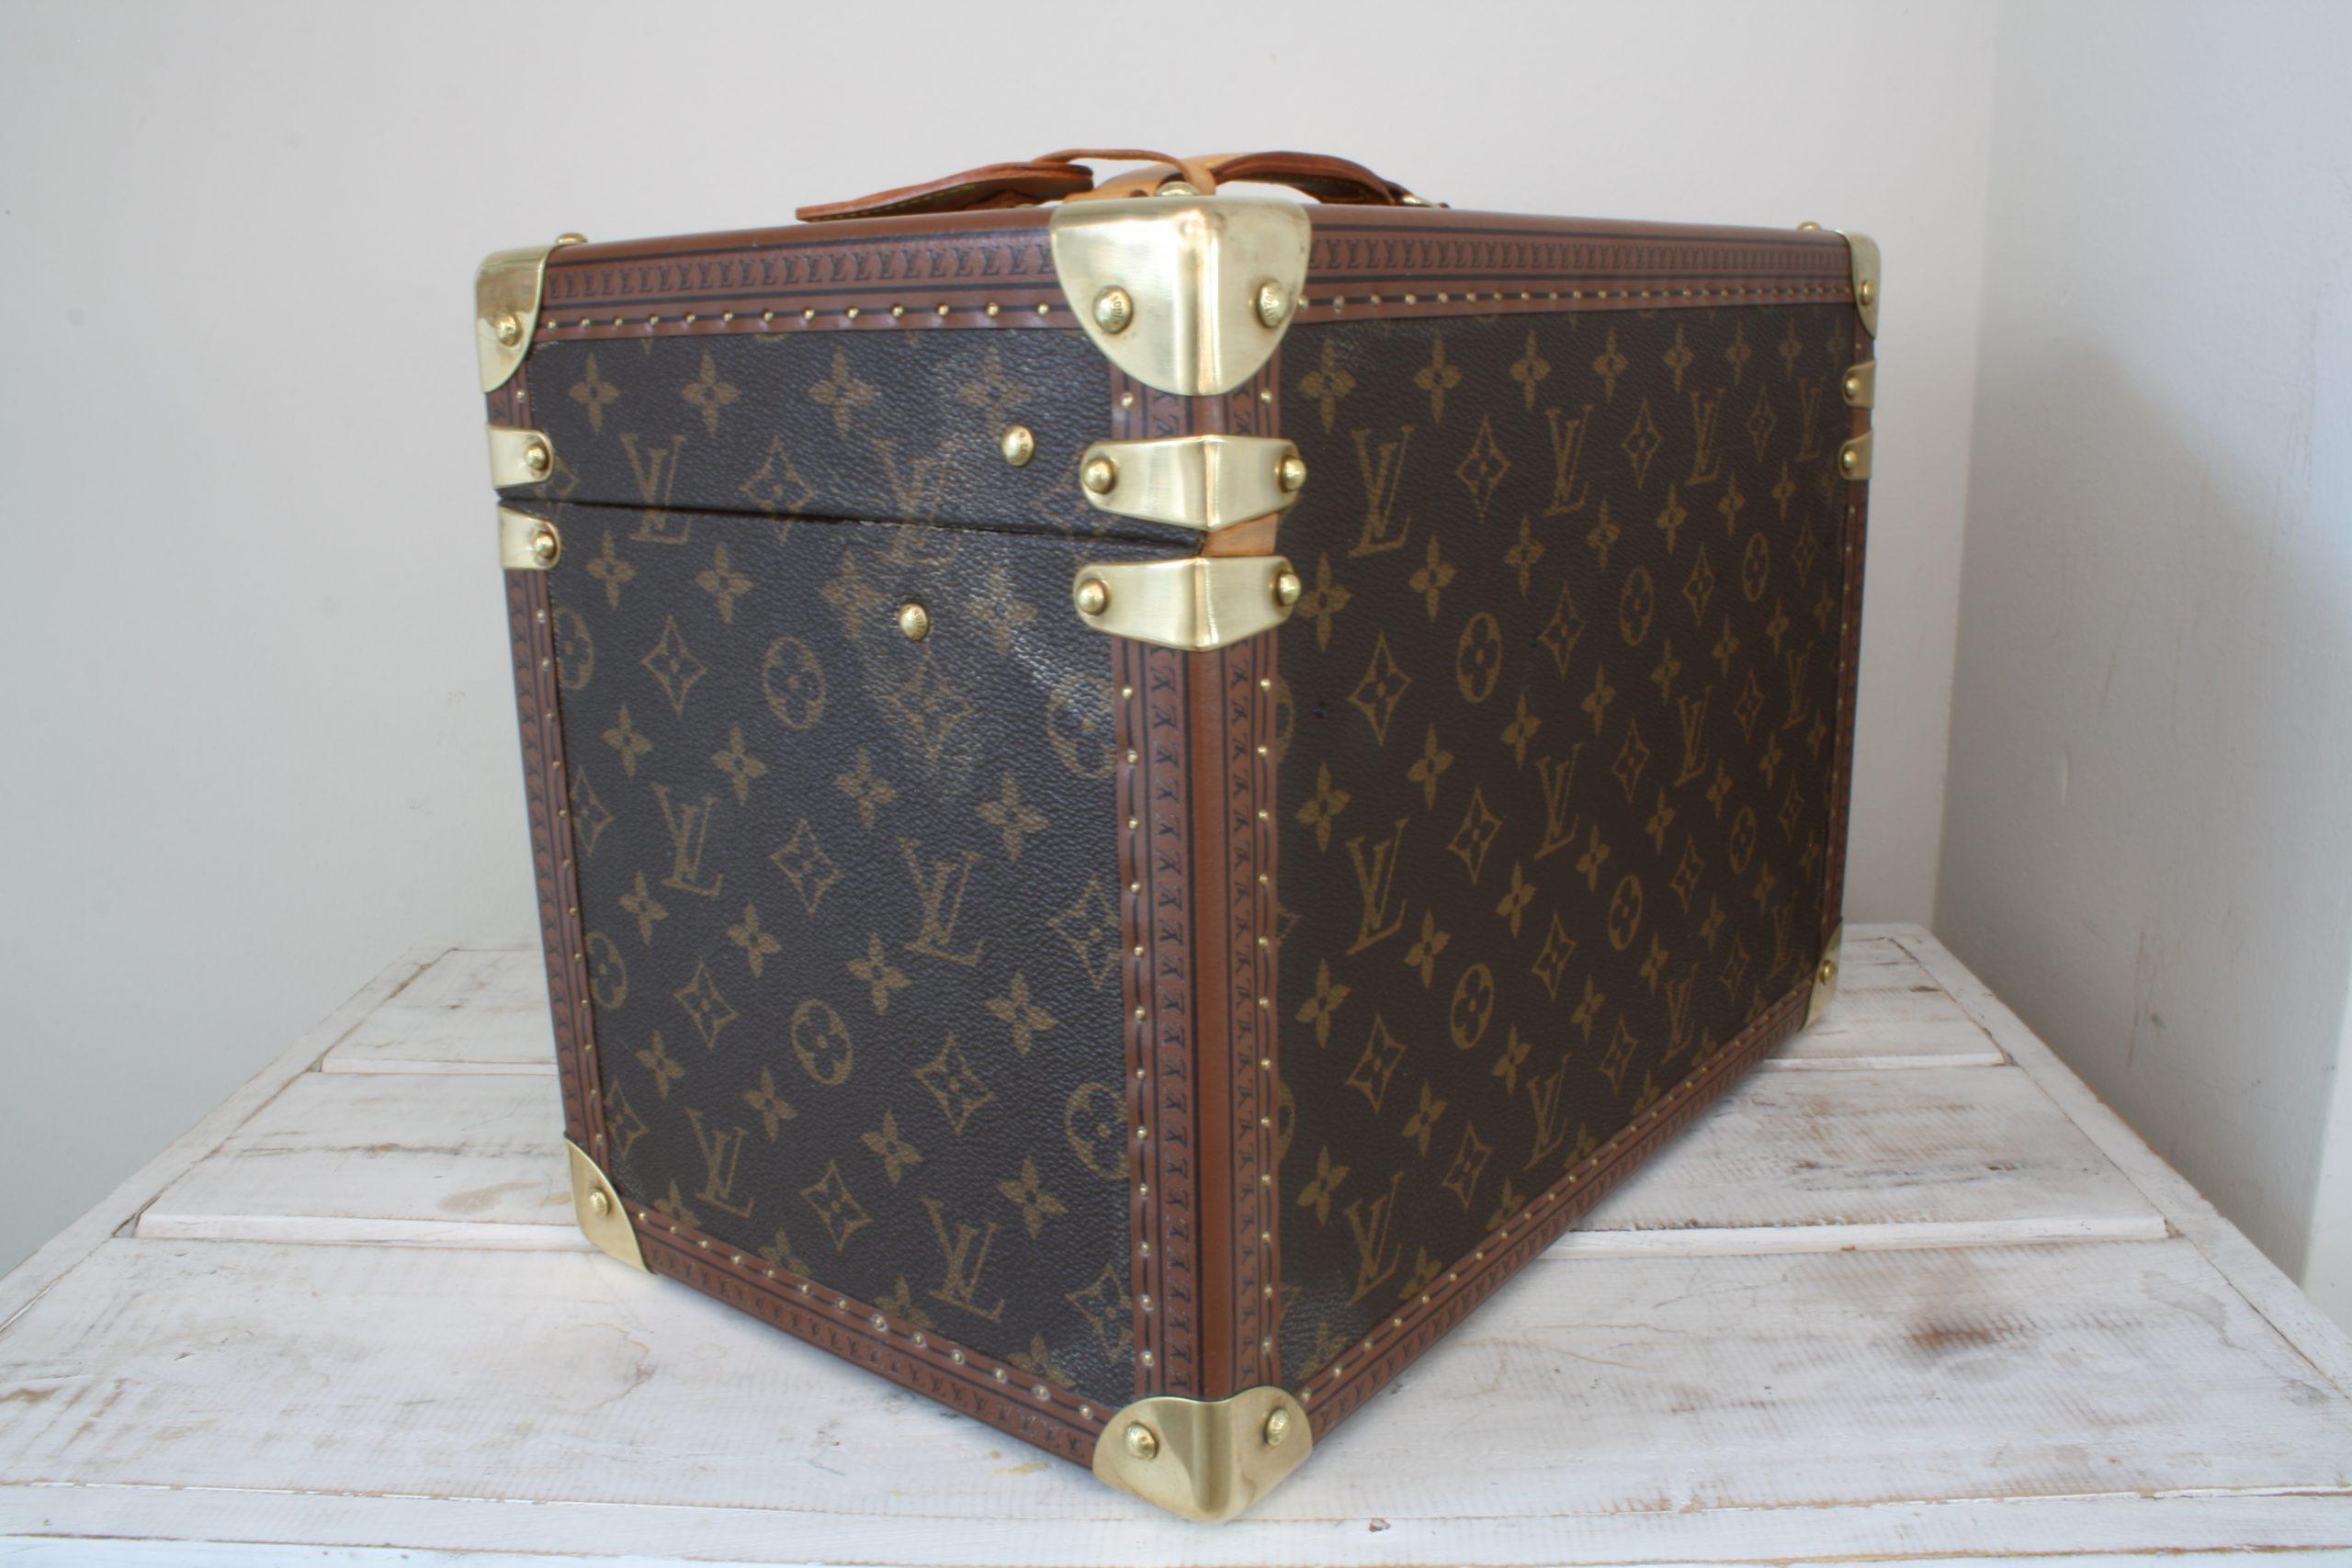 vintage-louis-vuitton-large-vanity-case-back-side-right